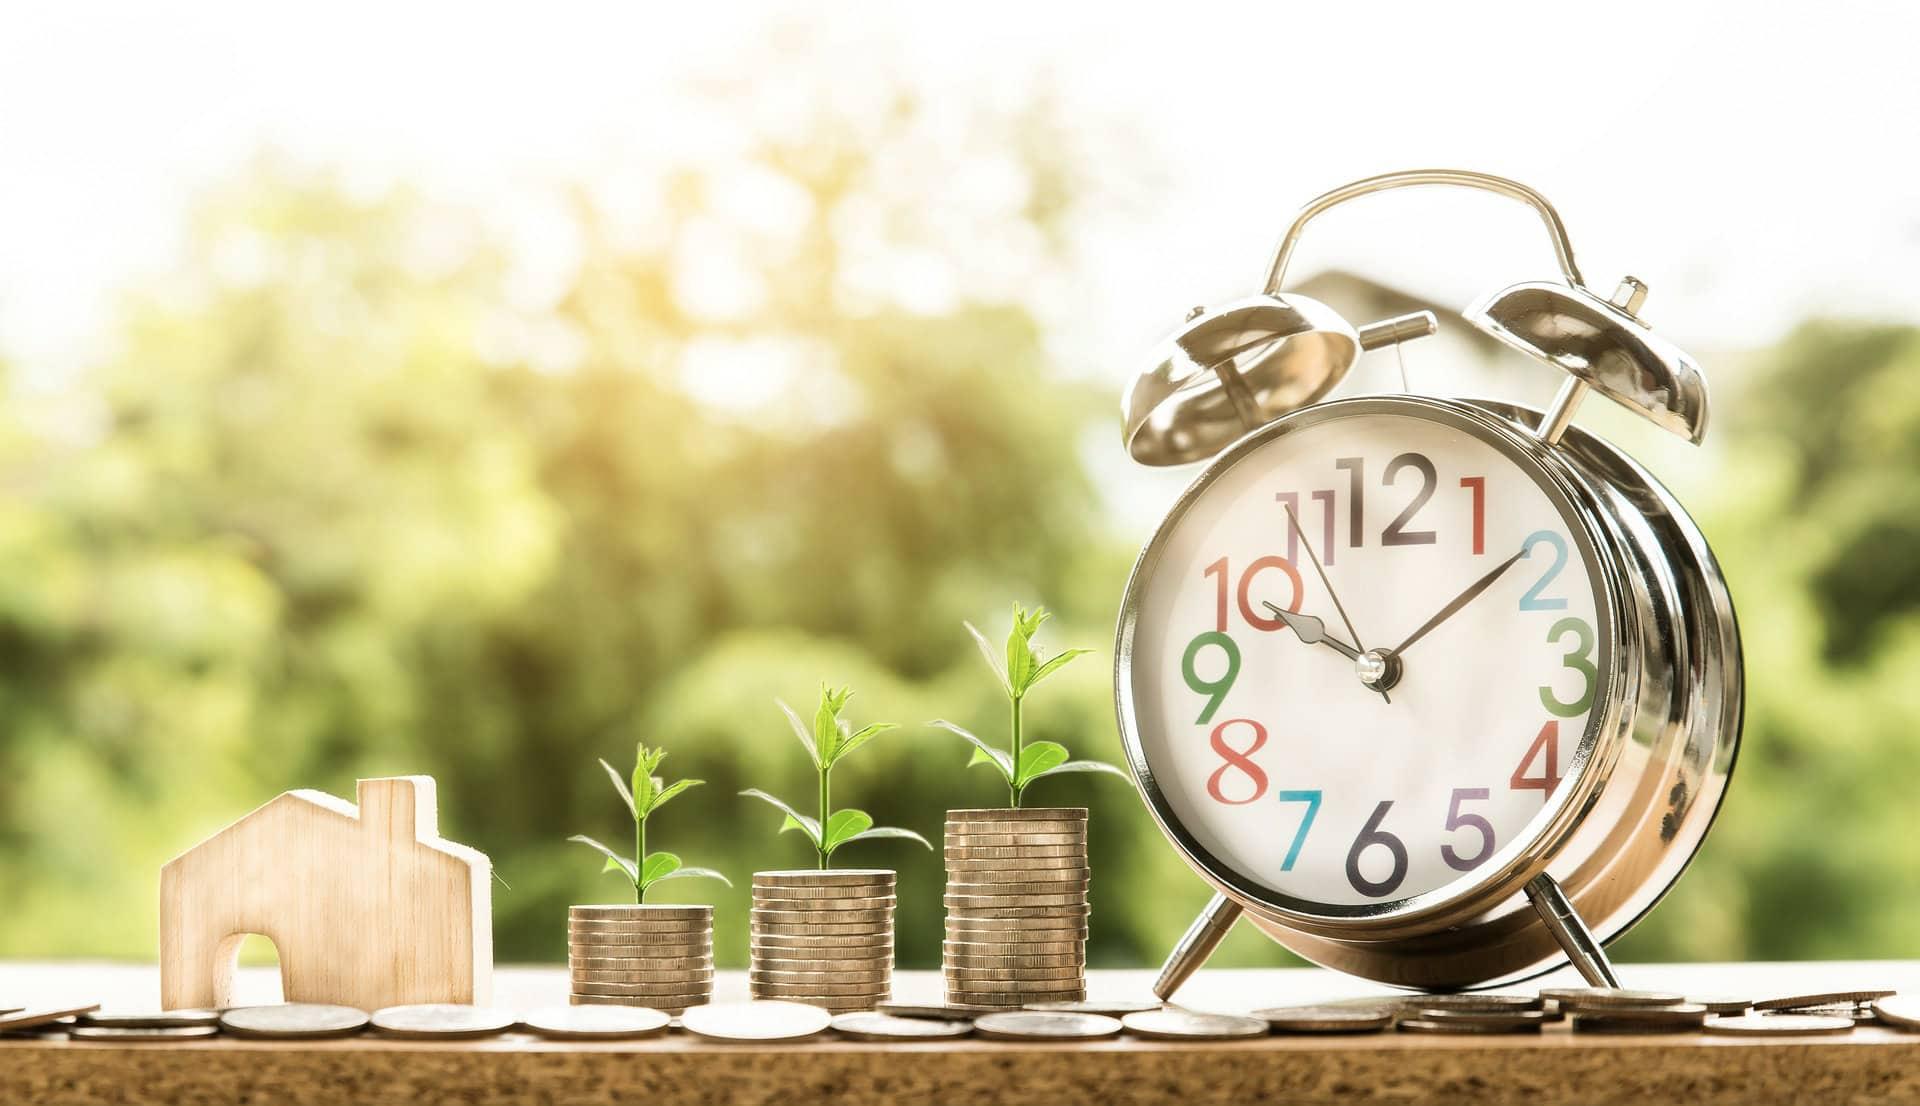 Investissement locatif : qu'est-ce qu'un bon rendement ?